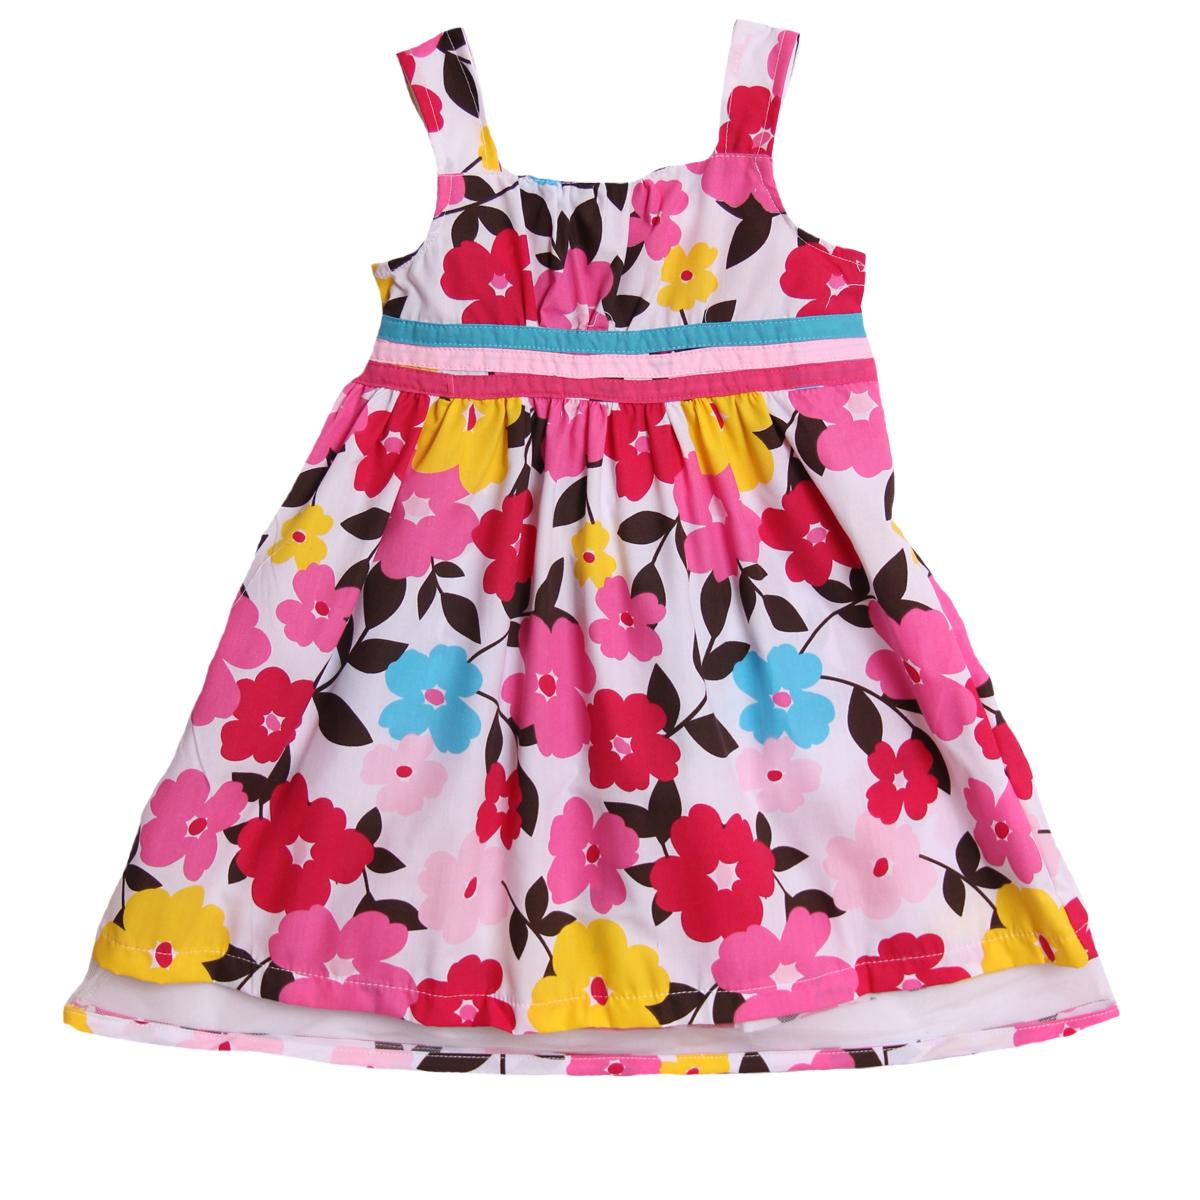 Sugah and Honey Little Girls' 1 Piece Pink Floral Print Summer Sundress Dress at Sears.com